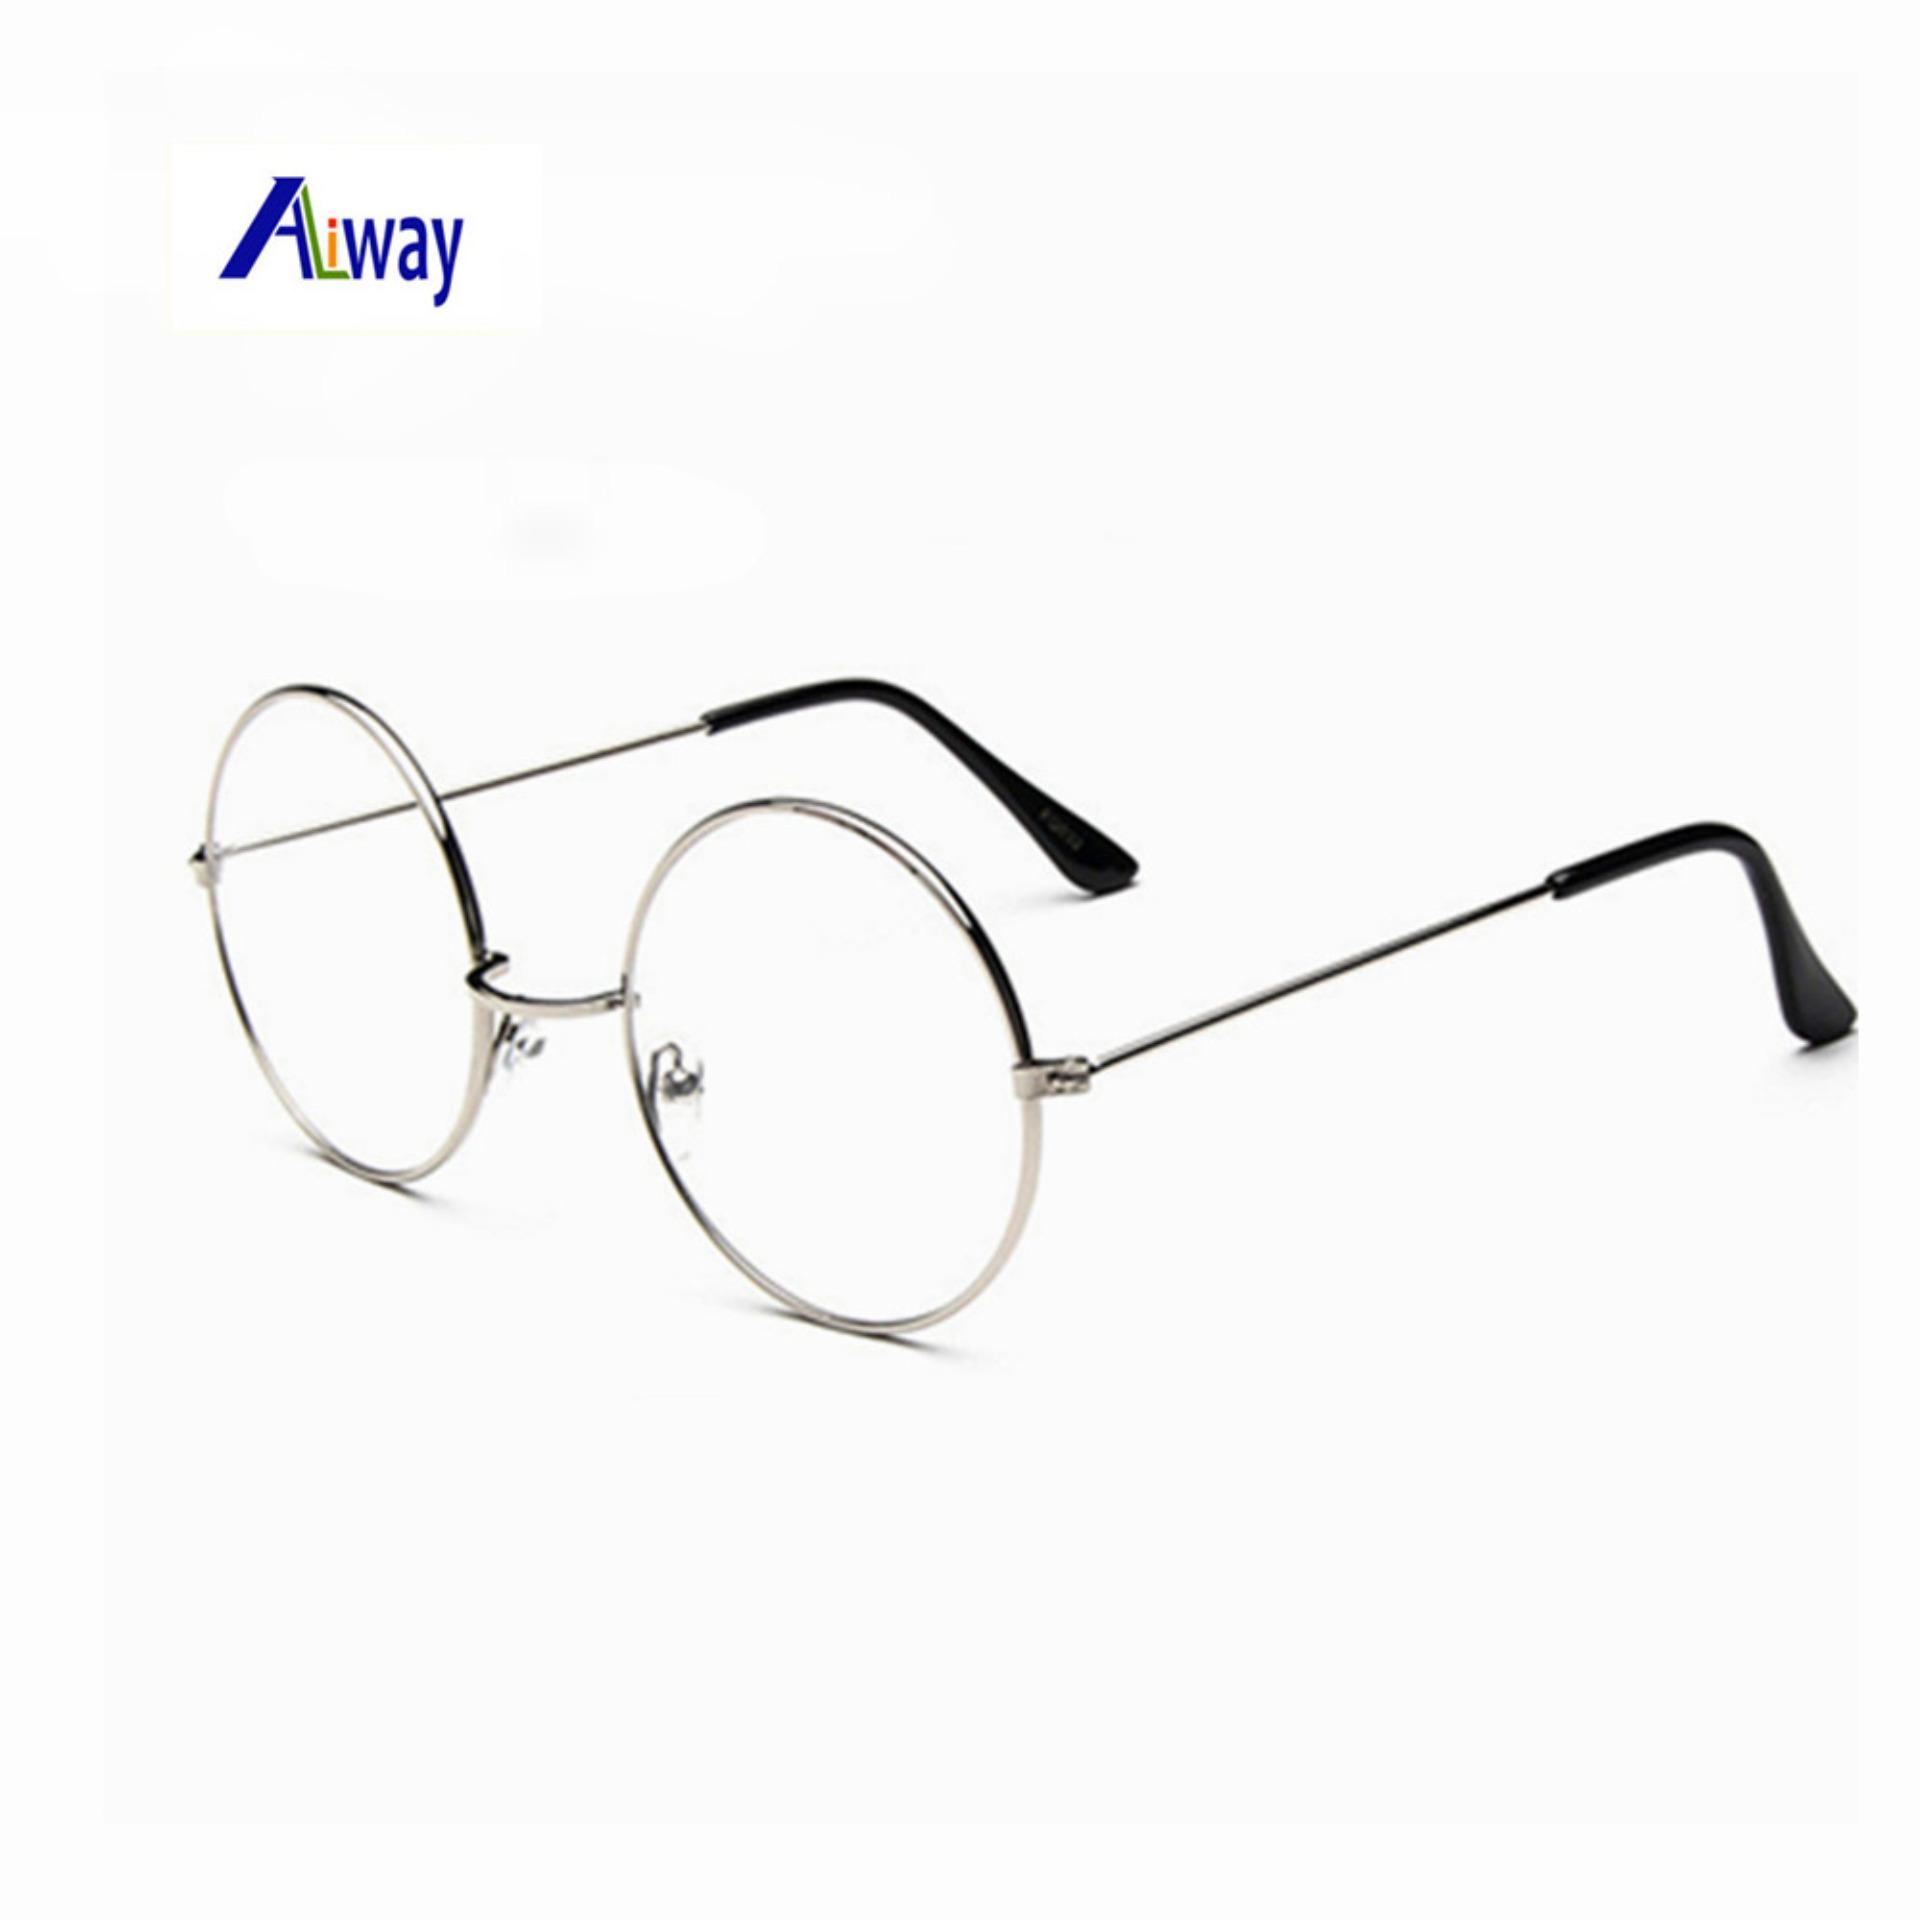 dcce826e9f4e Timely - Unisex Vintage Round Metal Frame Sunglasses 210 Silver - Kacamata  Wanita - Korea Style